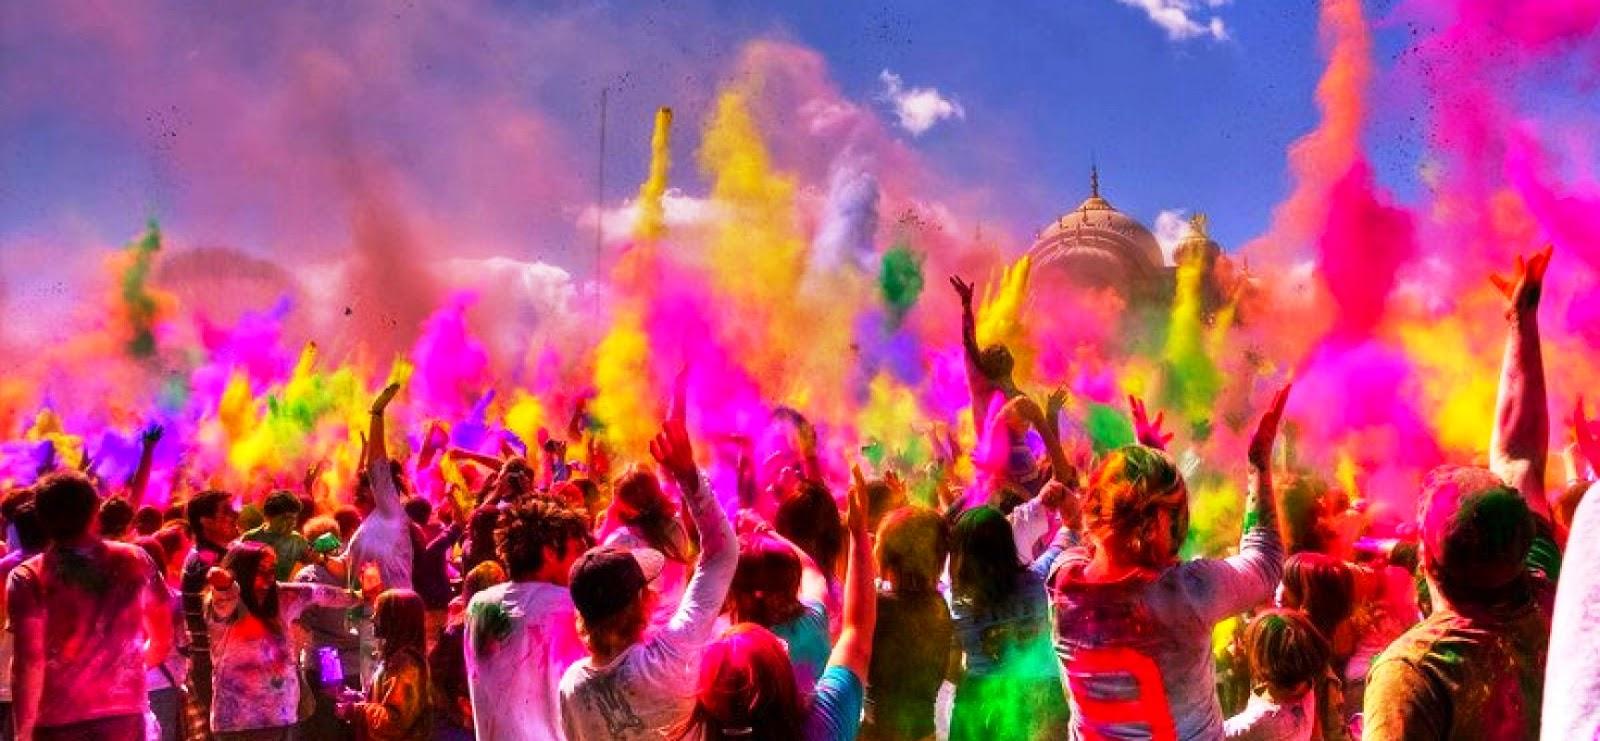 School essay on holi festival